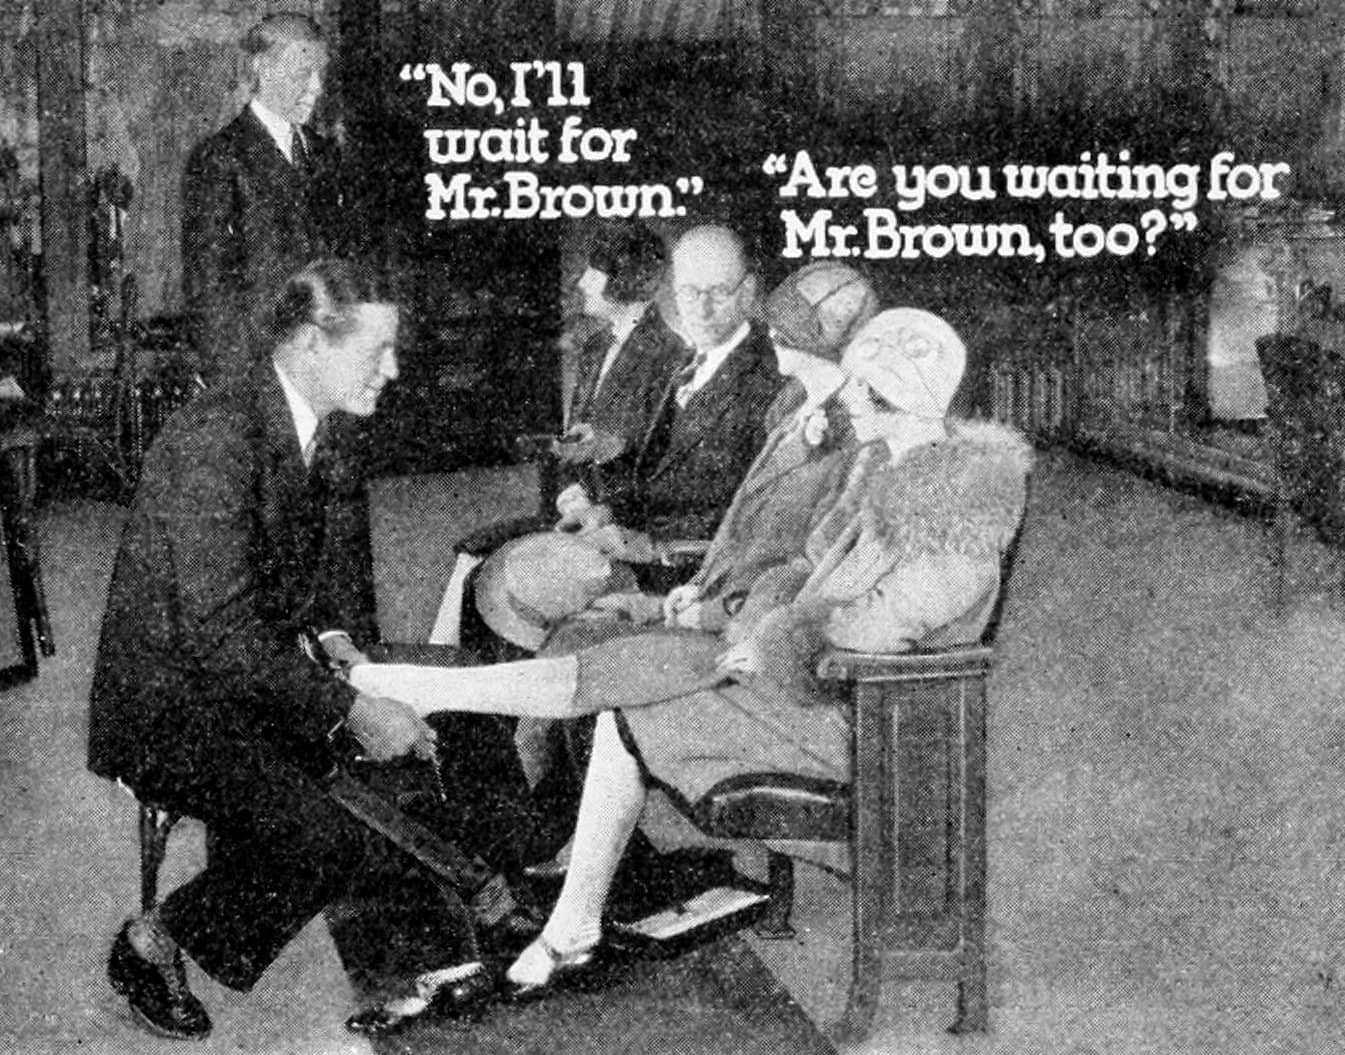 Vintage shoe stores - Waiting for salesman (1929)